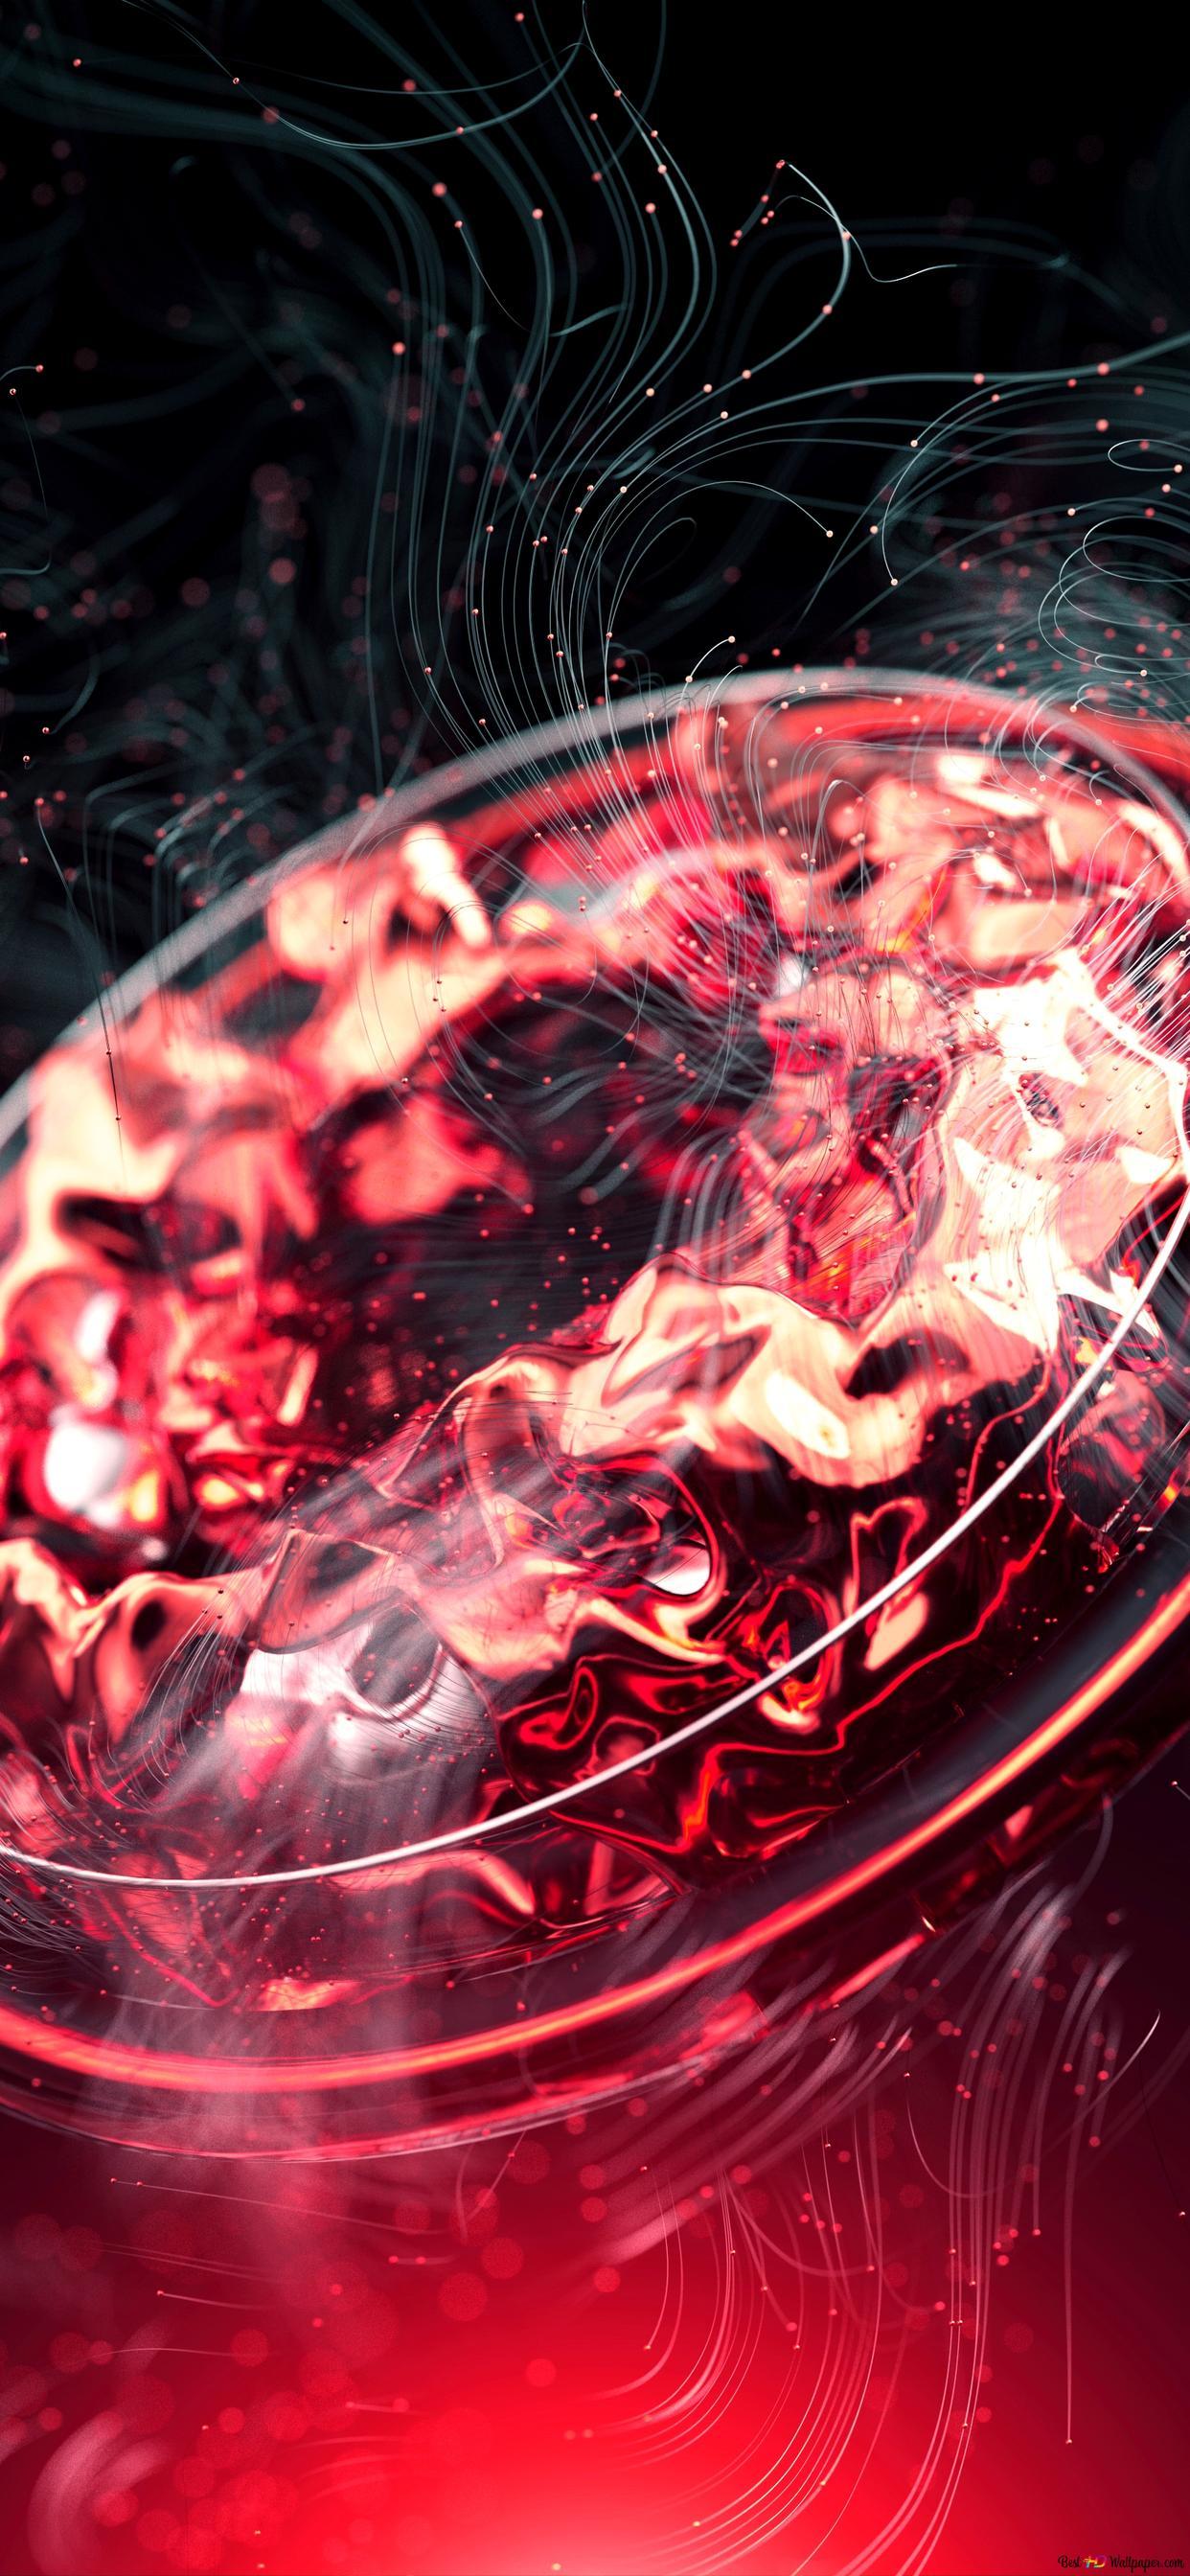 Abstract Red Circle Hd Wallpaper Download